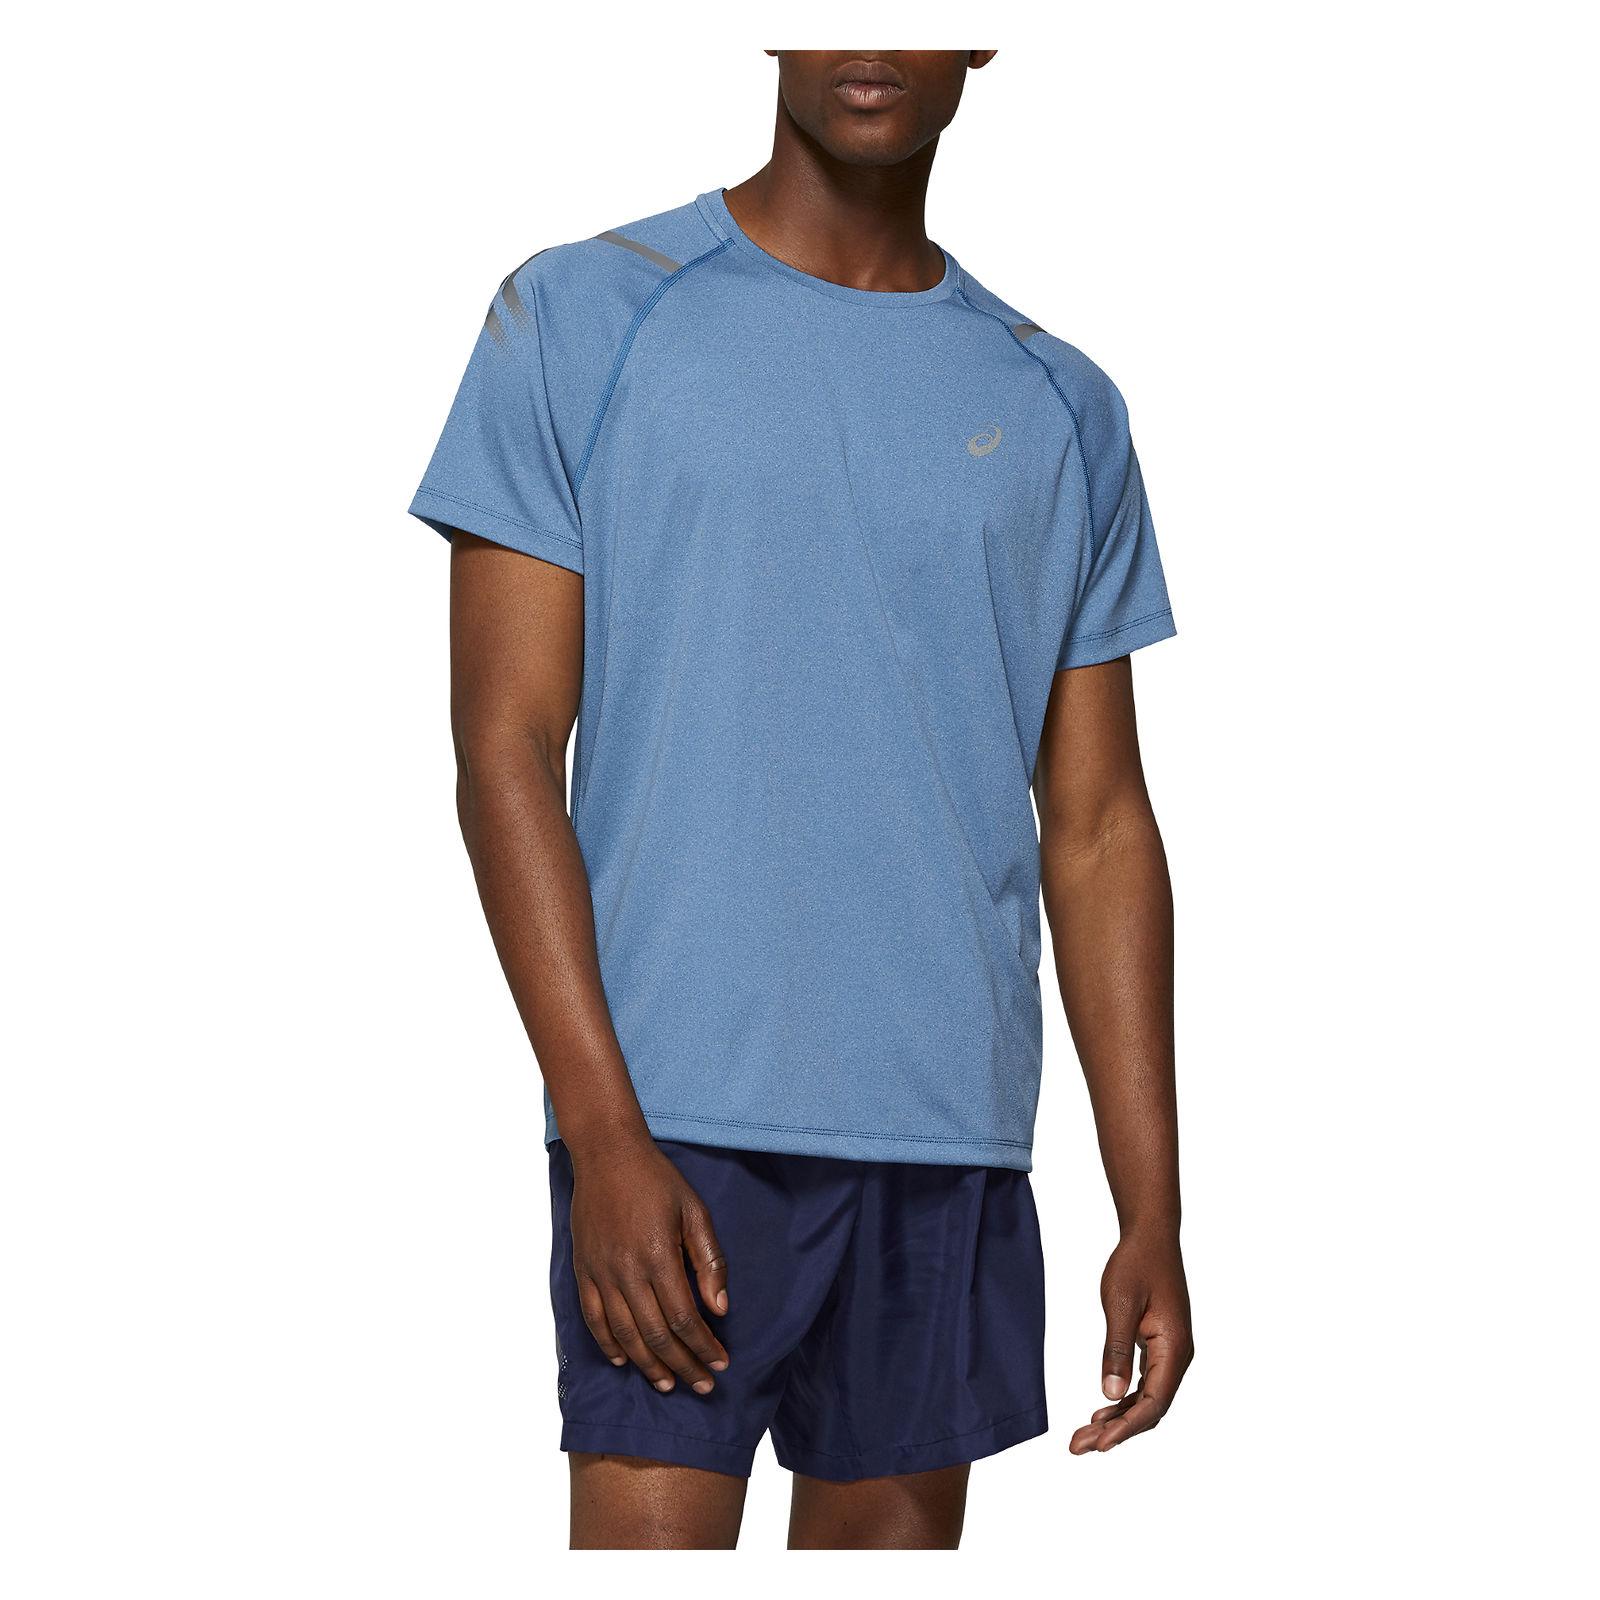 Koszulka męska do biegania Asics Icon SS 2011A259